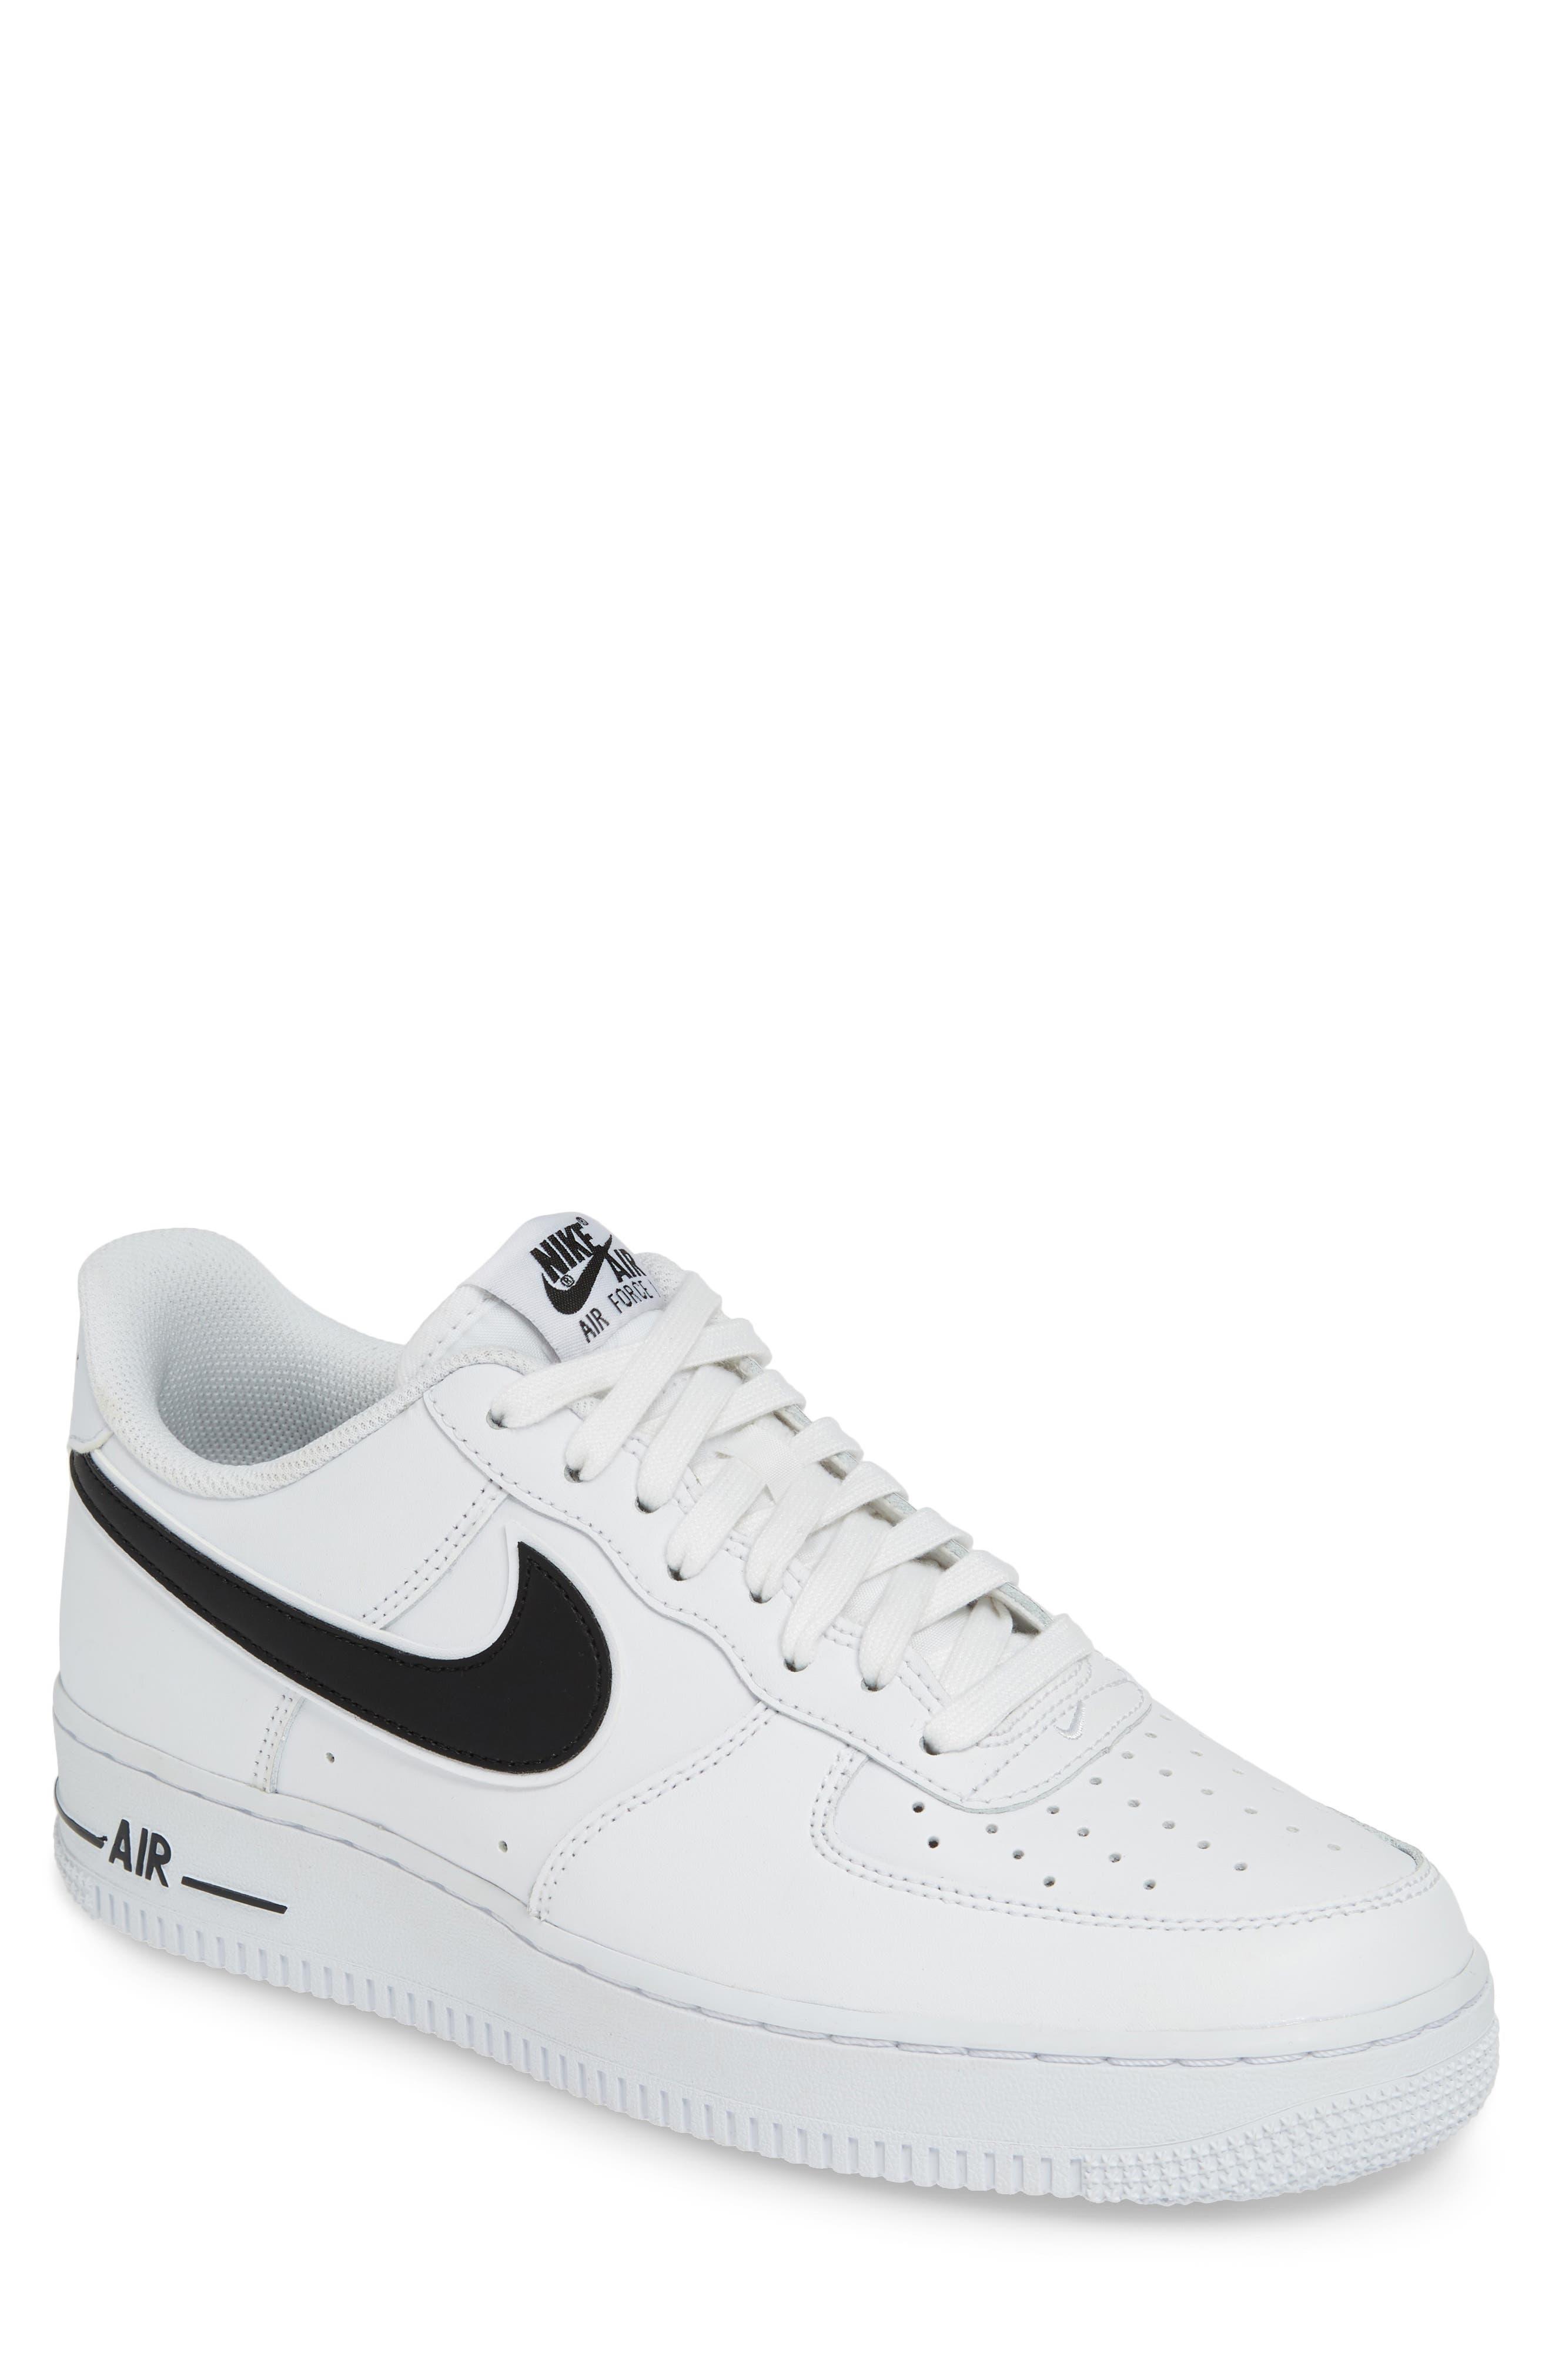 NIKE, Air Force 1 '07 3 Sneaker, Main thumbnail 1, color, WHITE/ BLACK